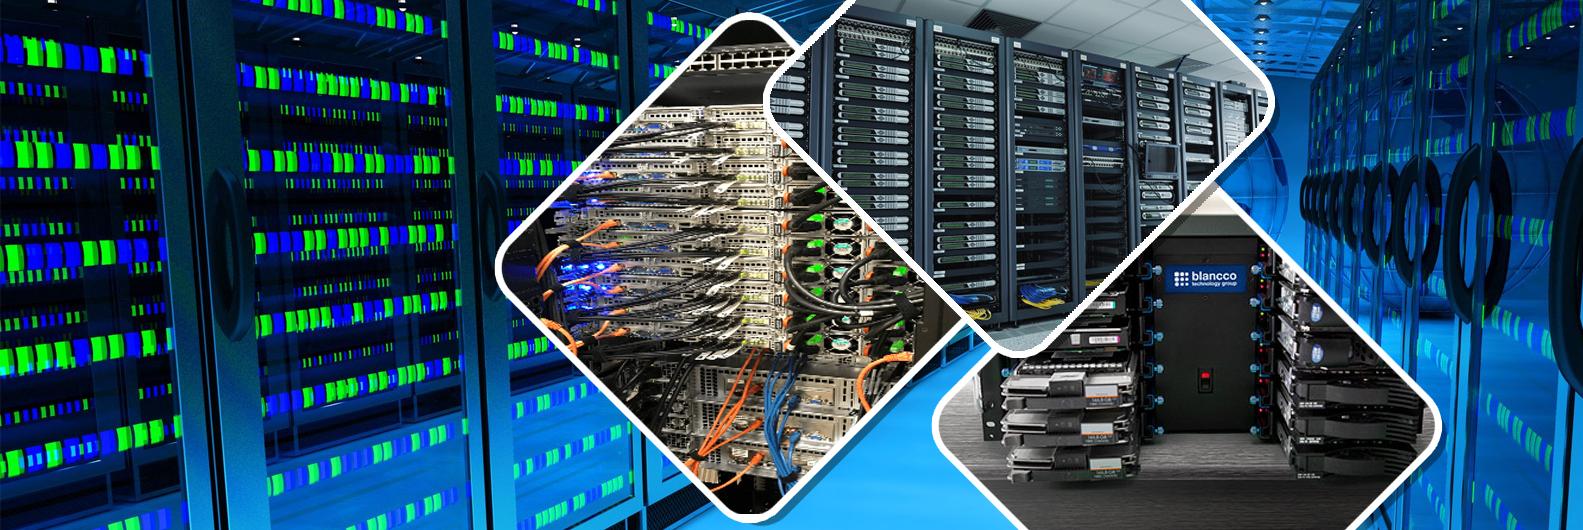 Computer services in Ajman | Laptop services in Ajman